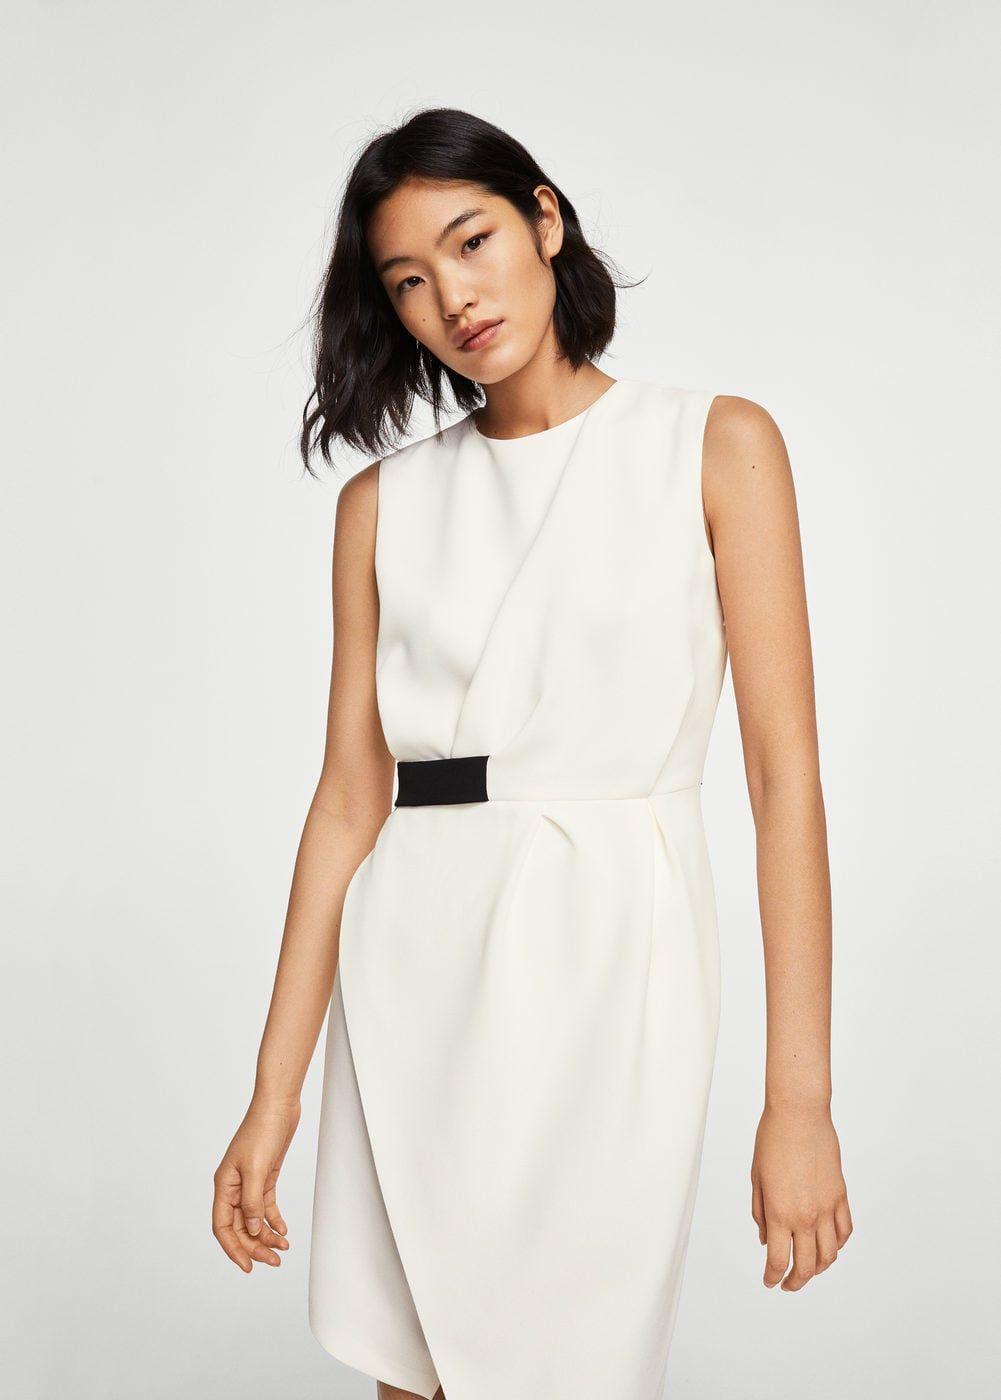 e1da24a52e Flowy fabric Straight design Round neck Contrast elastic waist Asymmetrical  hem Sleeveless Asymmetric button fastening at back